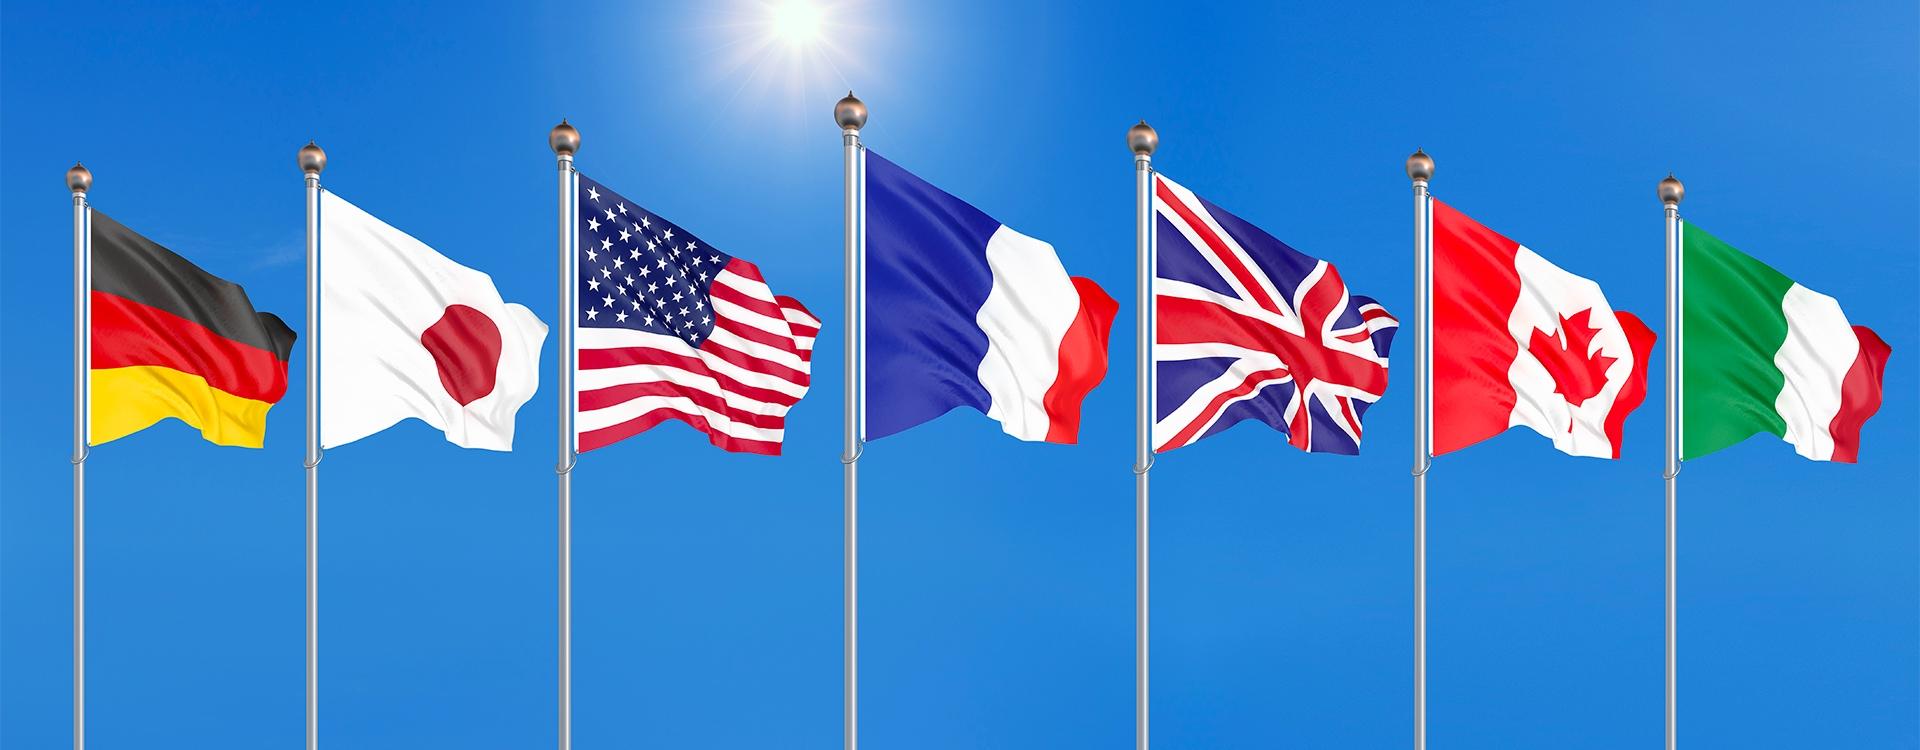 G7 à Biarritz : bilan